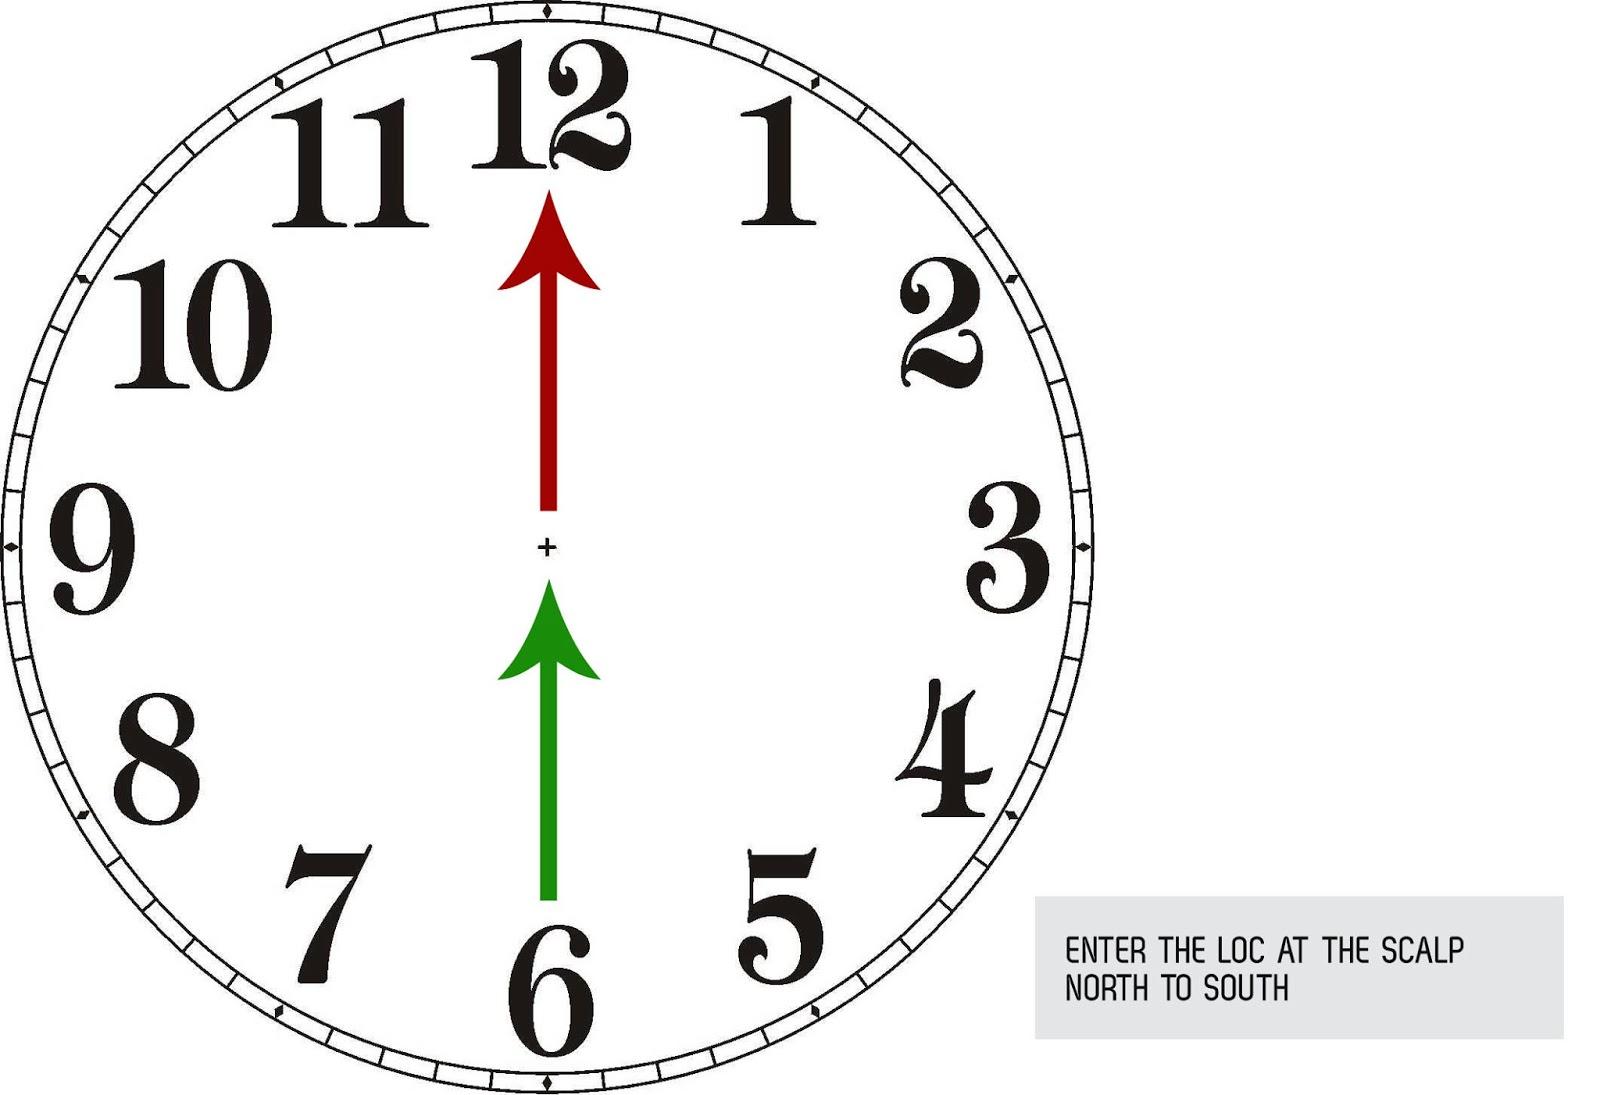 kreyola s journeys how to interlocking patterns with clock diagram rh kreyolasjourneys com diagram of a lockset diagram of a cockroach